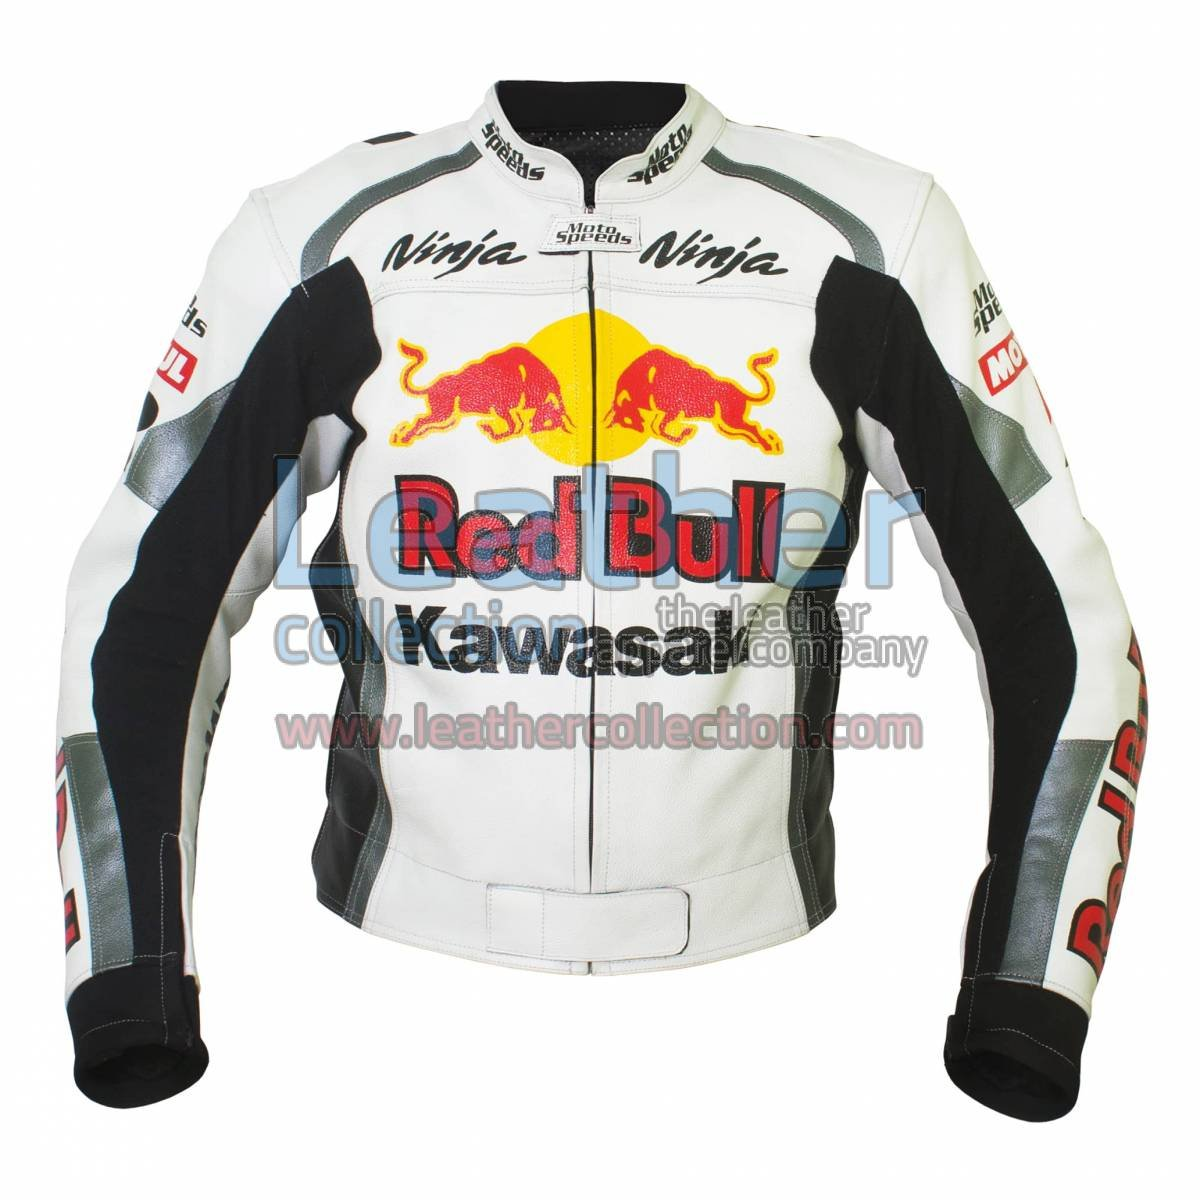 Kawasaki Ninja Redbull Motorbike Leather Jacket